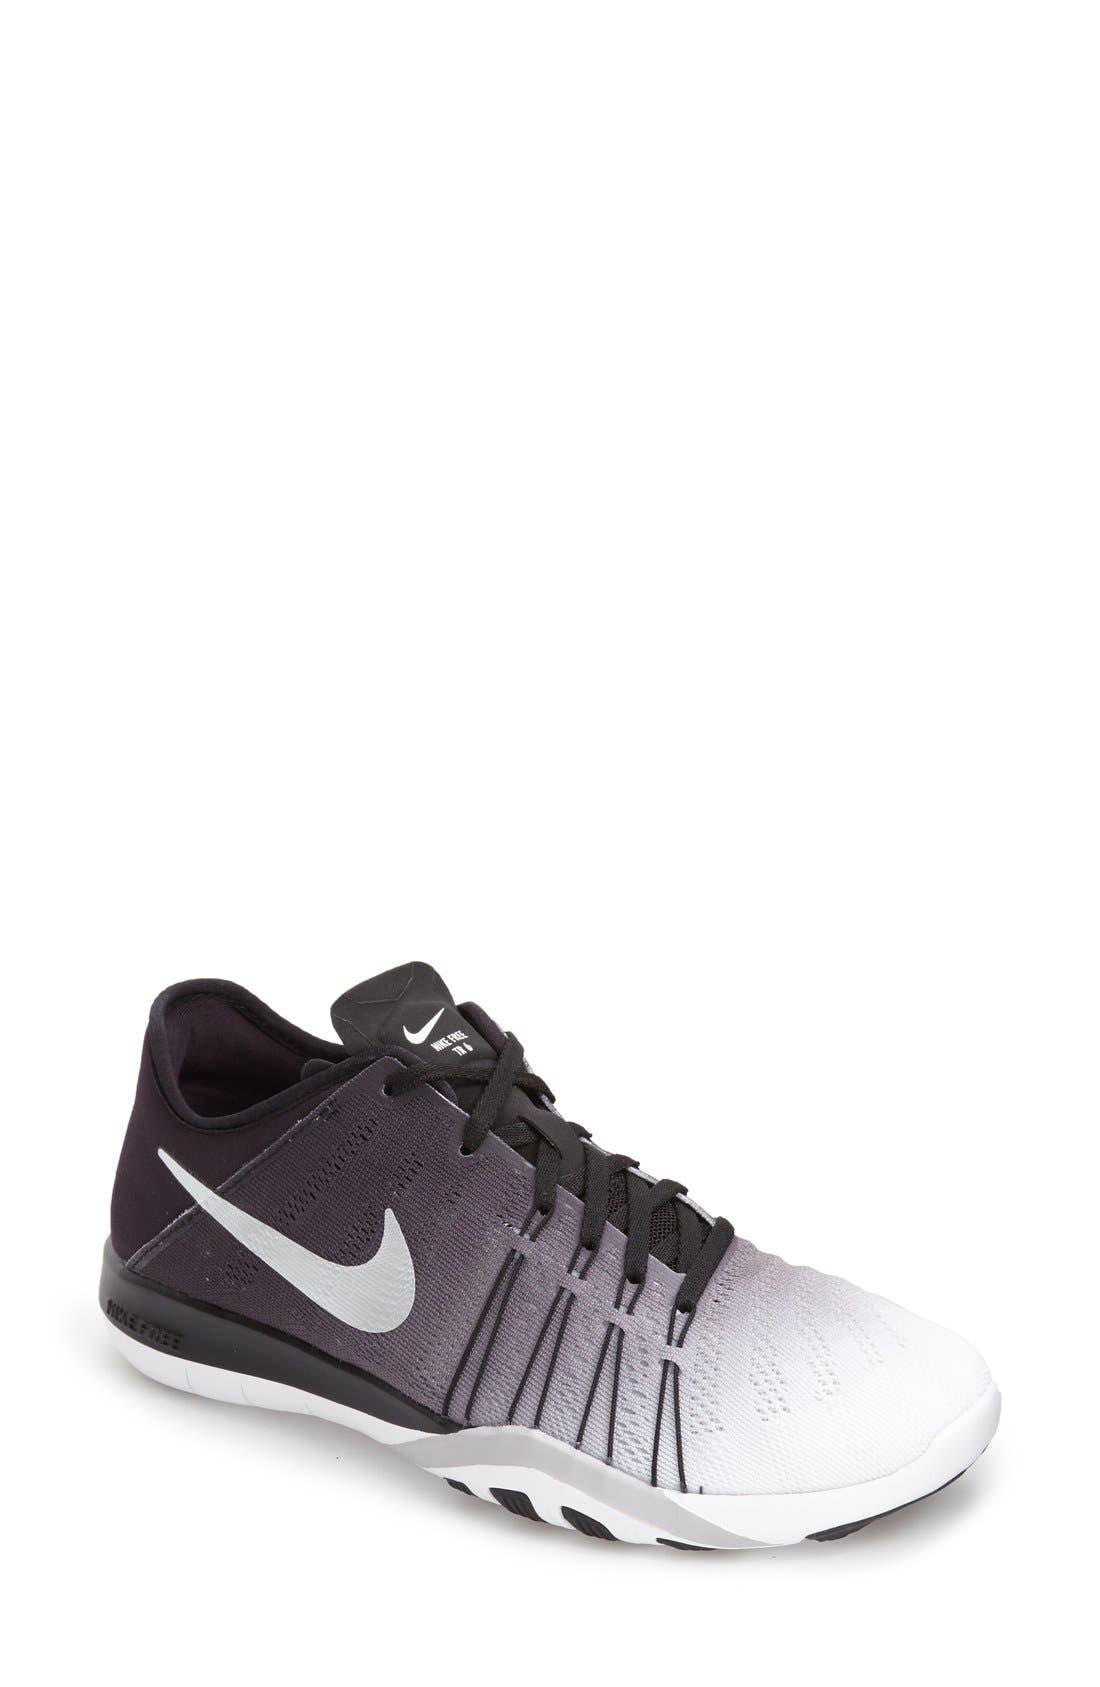 Main Image - Nike Free TR 6 Spectrum Training Shoe (Women)